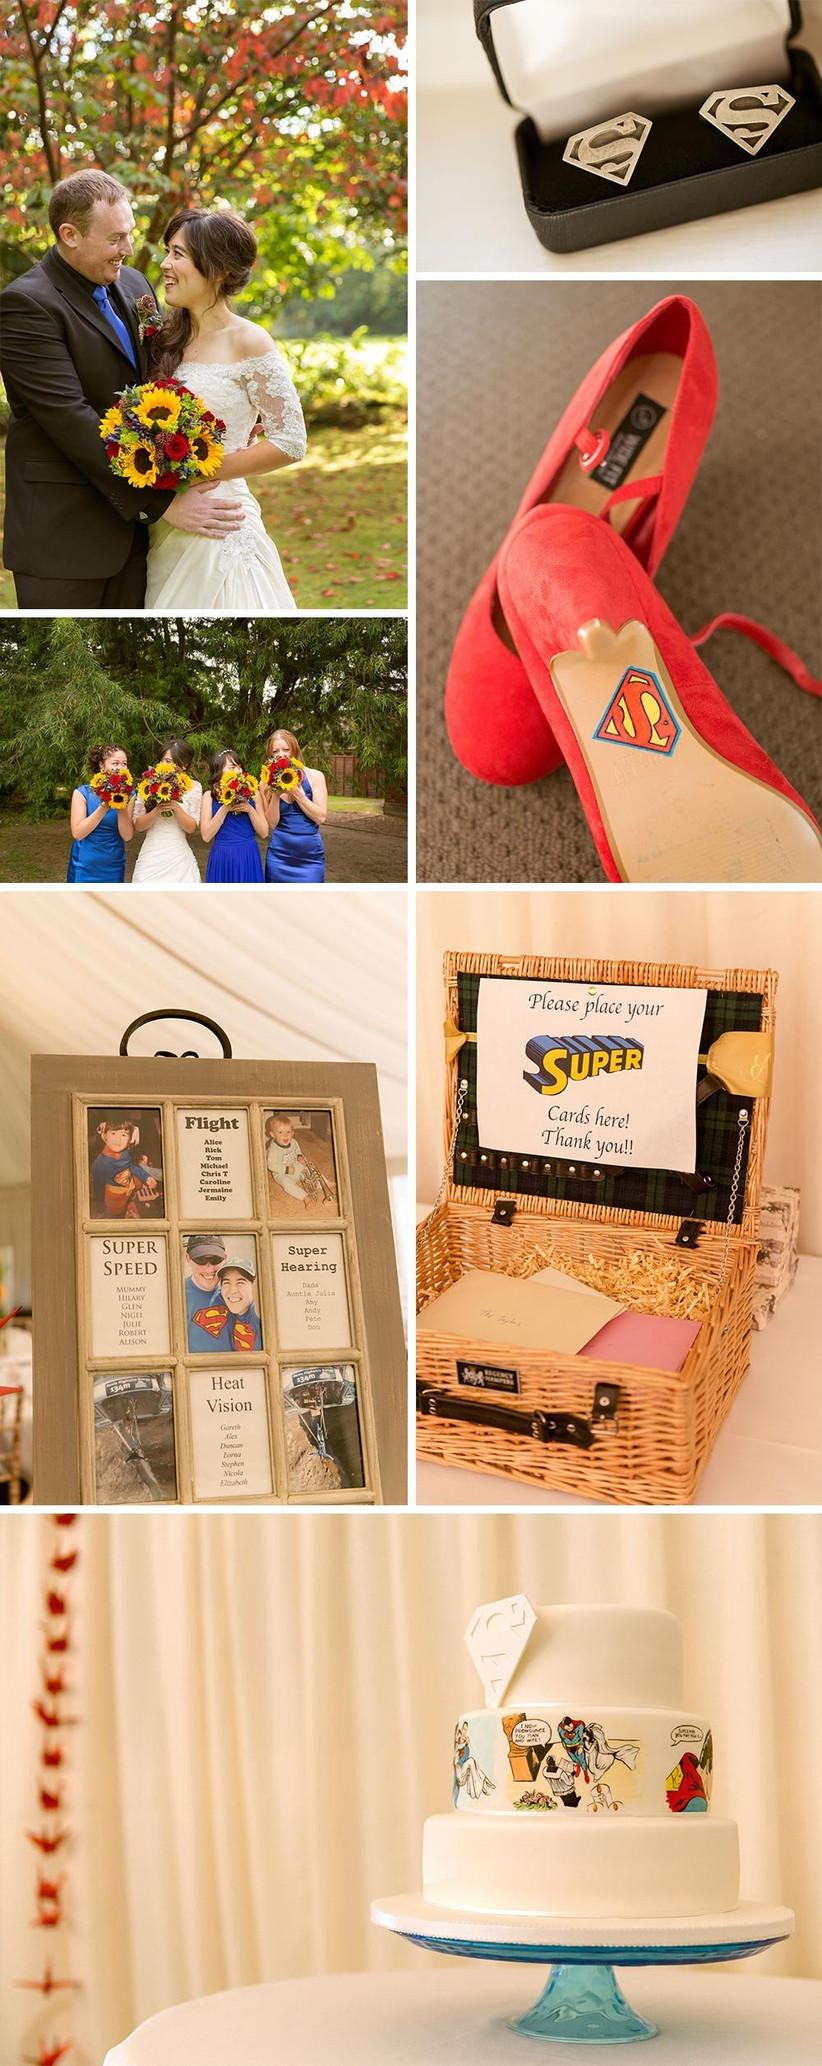 wedding-with-an-unusual-superman-wedding-theme